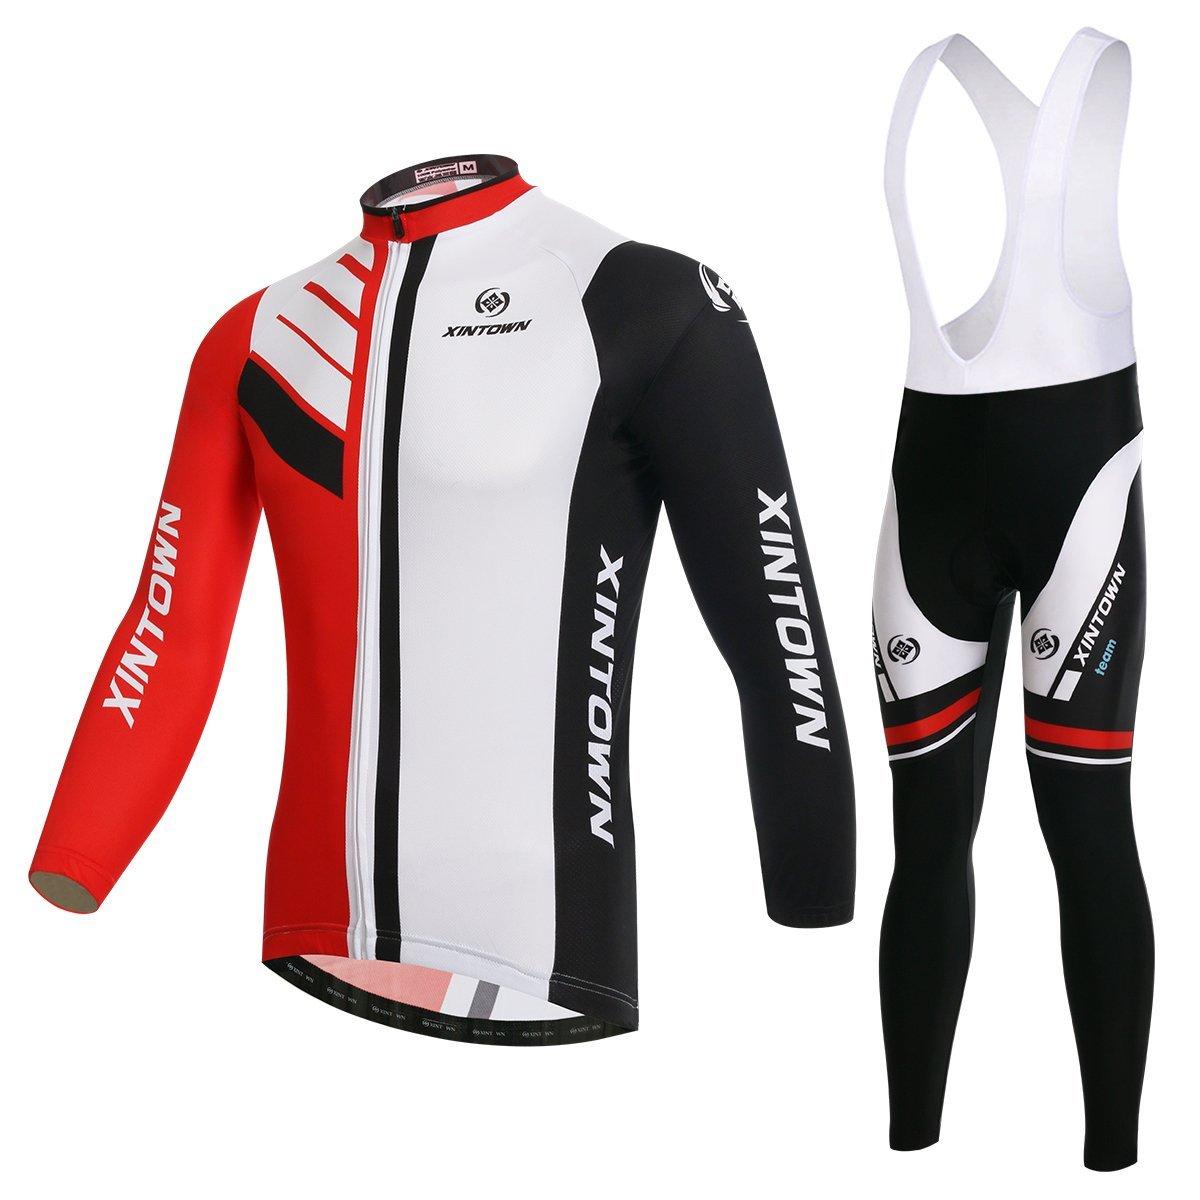 besylユニセックスPrintedハイパフォーマンスメッシュサイクリング服スーツ、通気性長袖サイクリングジャージーとよだれかけのパッド入りパンツキット自転車自転車乗馬Biker (レッドホワイトブラック) B018G62ANE  Fleece-Bib-Long-Set XXL (US XL)